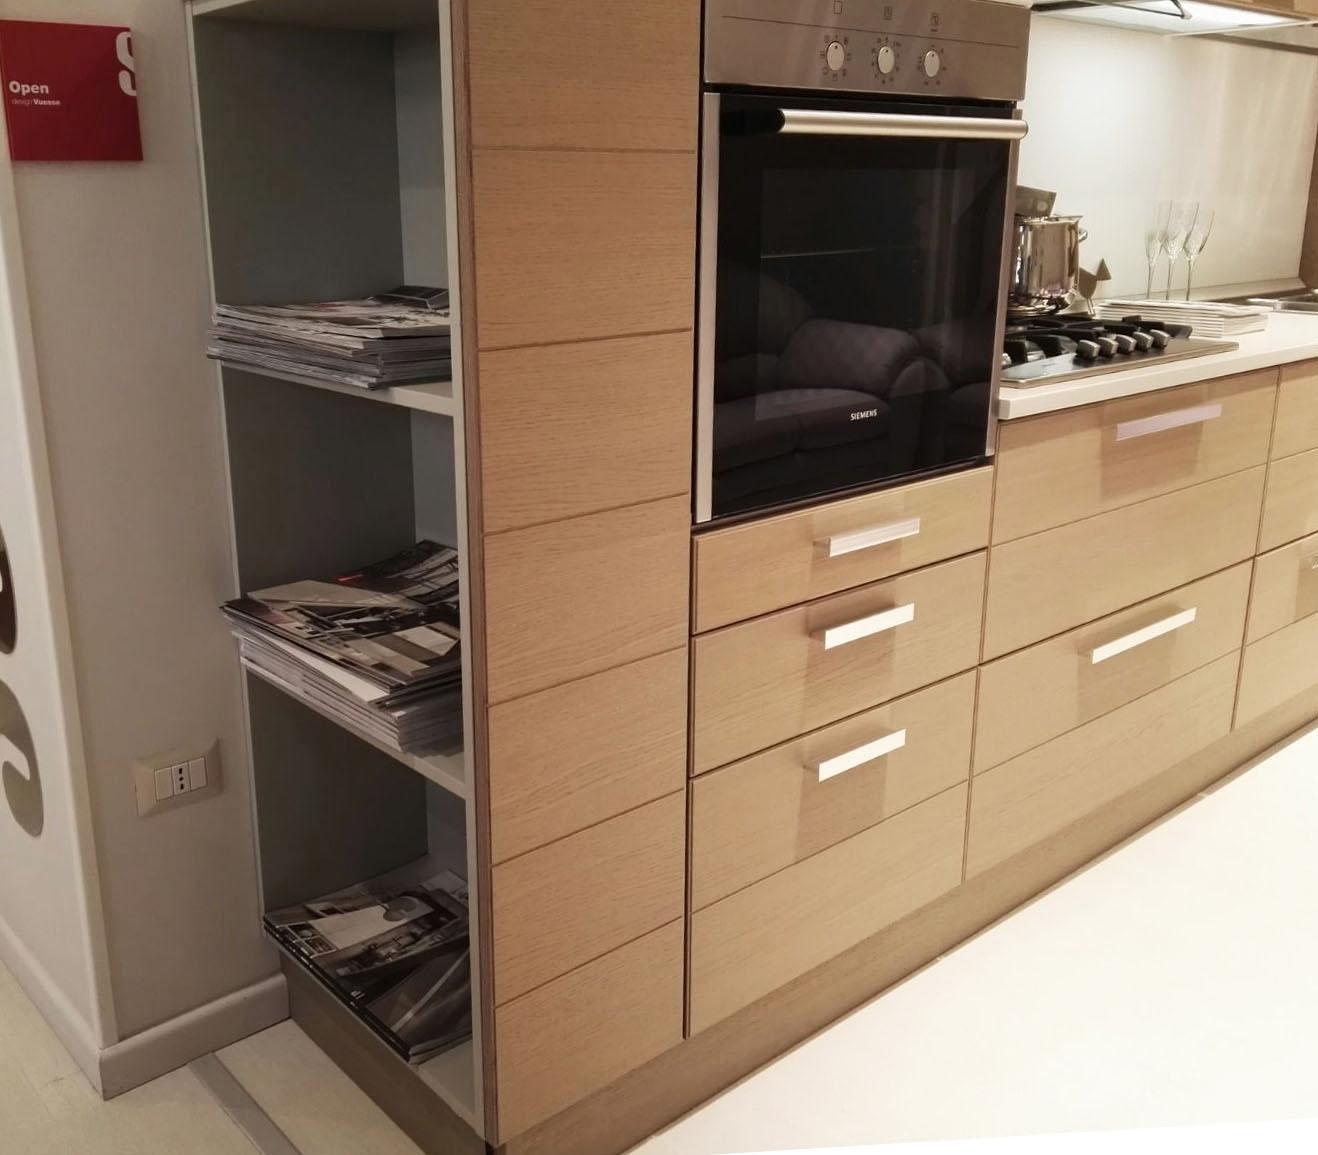 Cucina scavolini open moderna legno cucine a prezzi scontati for Cucina moderna prezzi